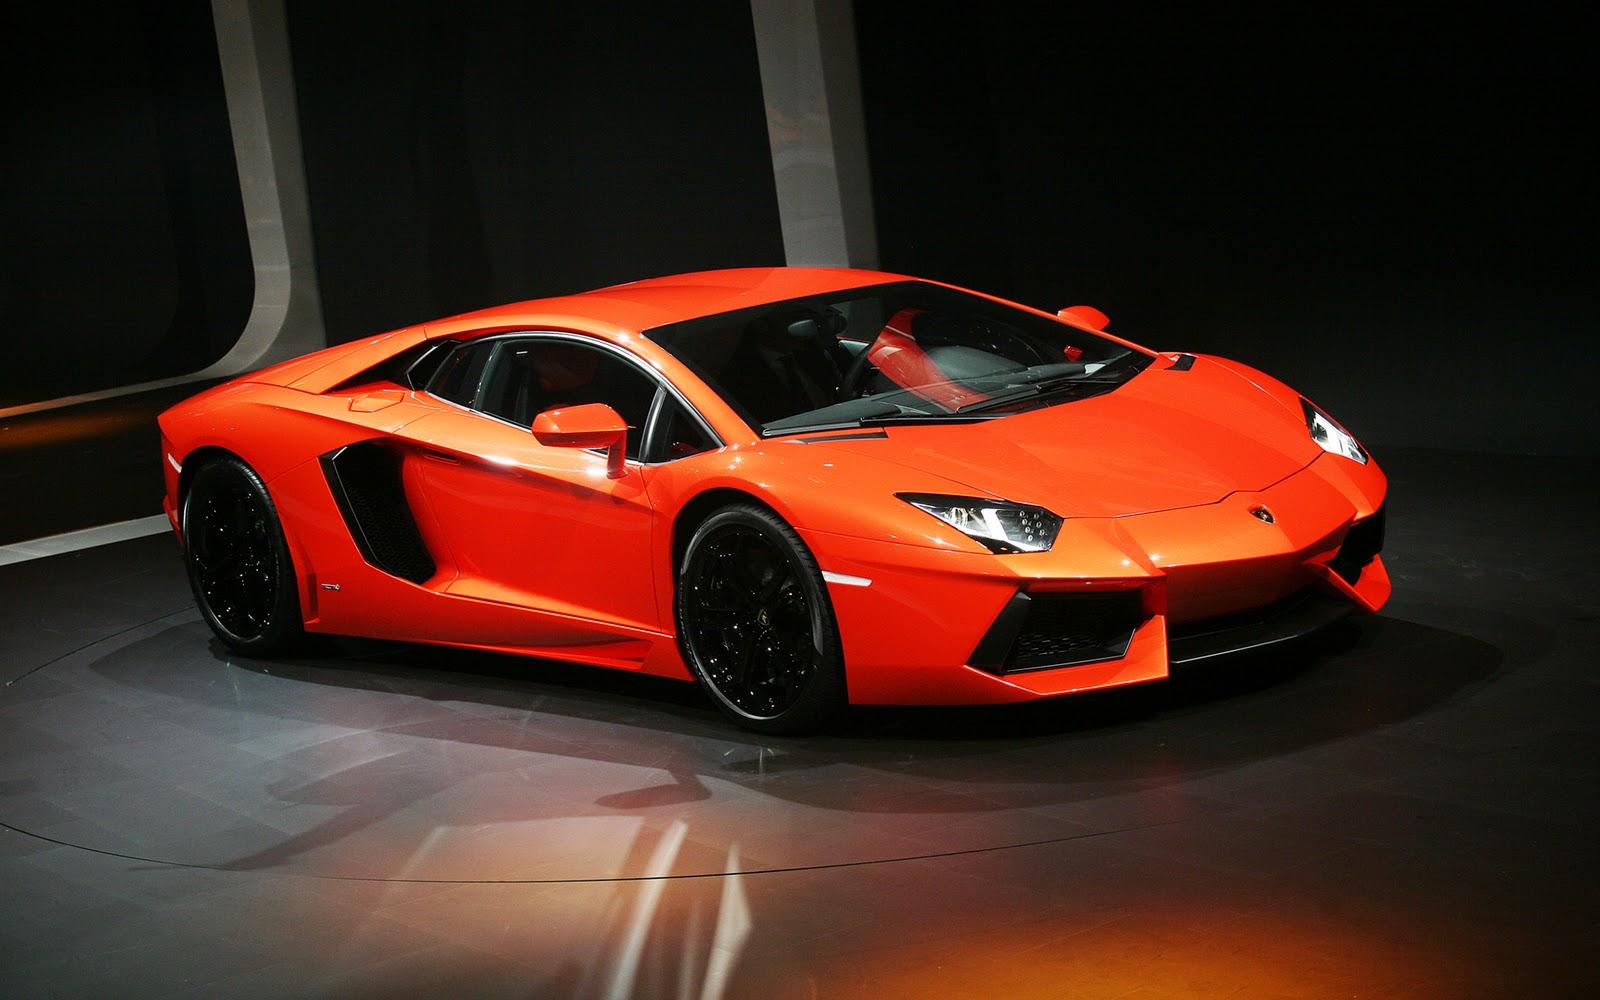 How does the lamborghini aventador compare to the lamborghini murcielago? Hd Car Wallpapers Lamborghini Aventador Wallpaper